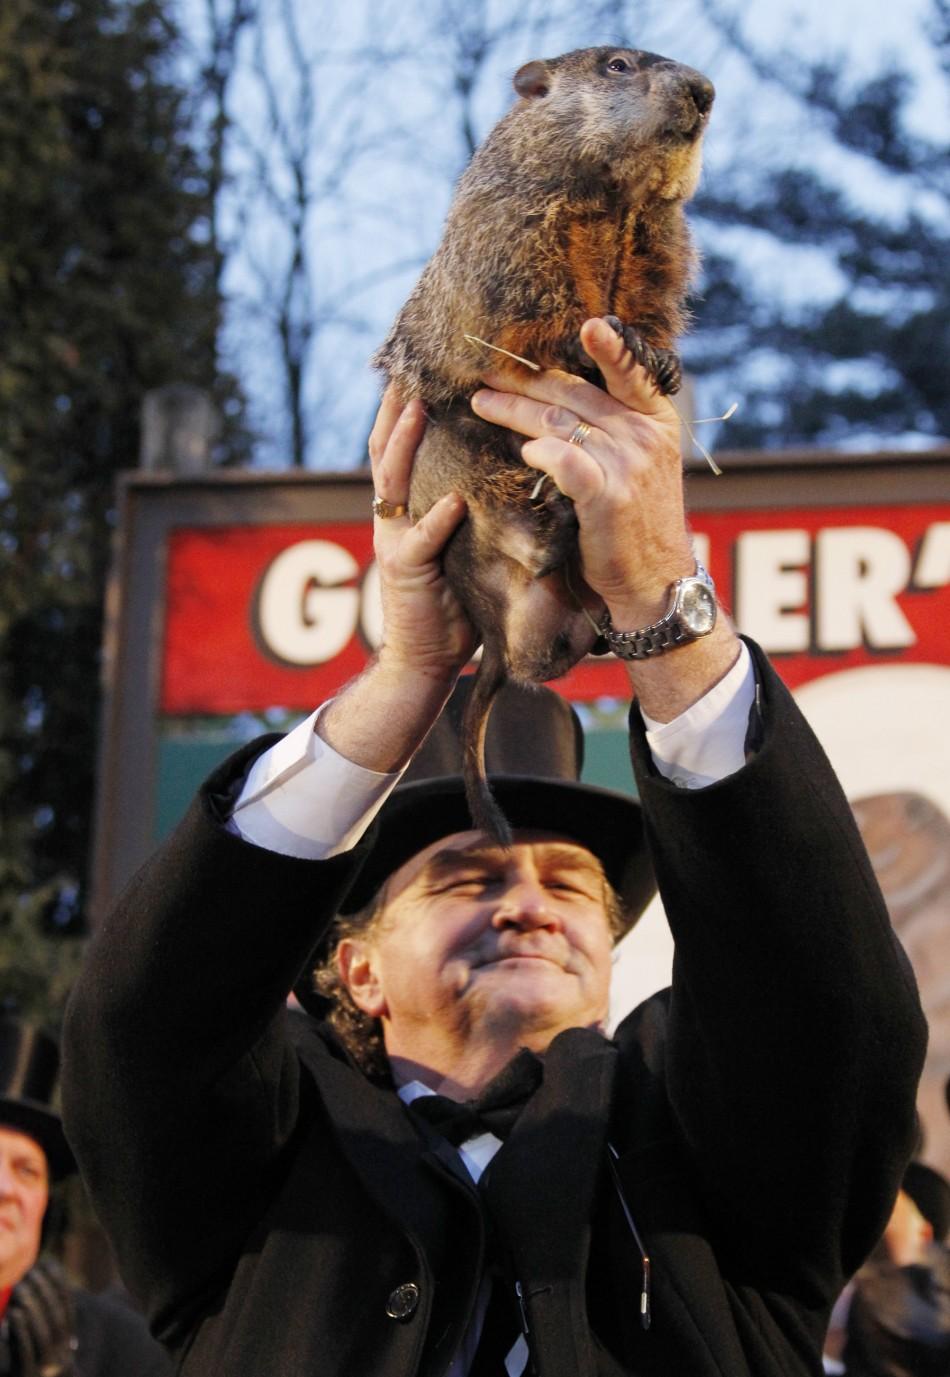 Groundhog Day 2014: Punxsutawney Phil Sees His Shadow